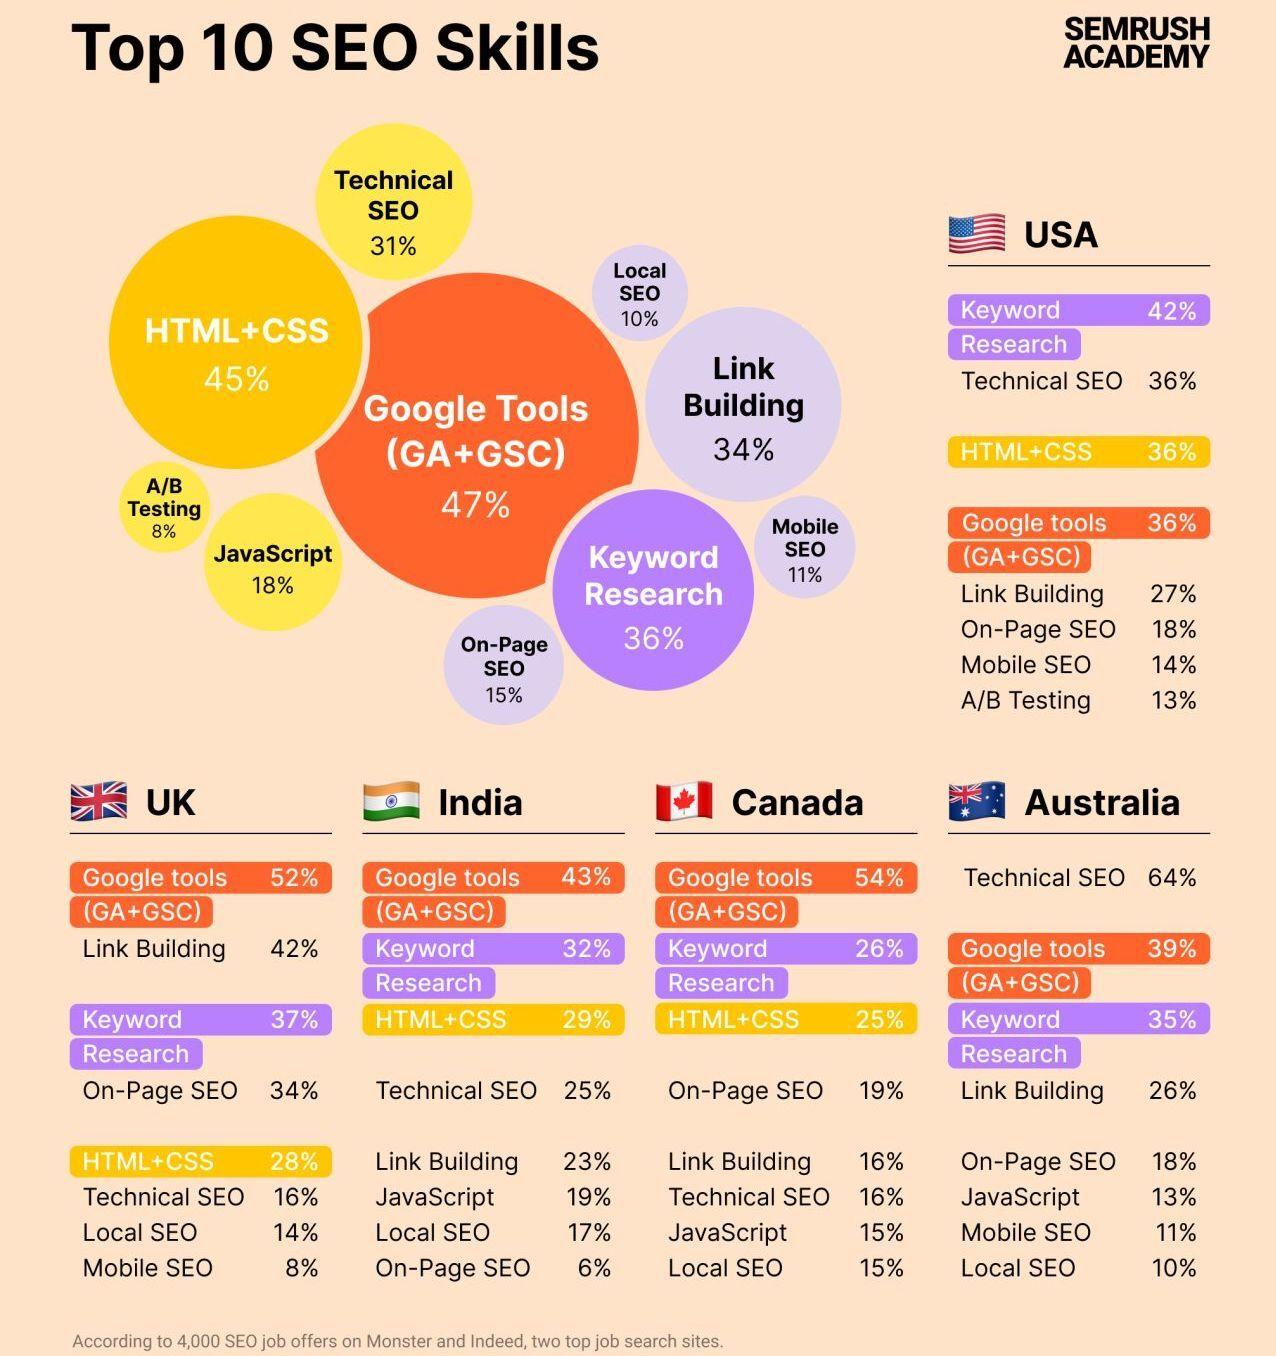 SEO skills infographic